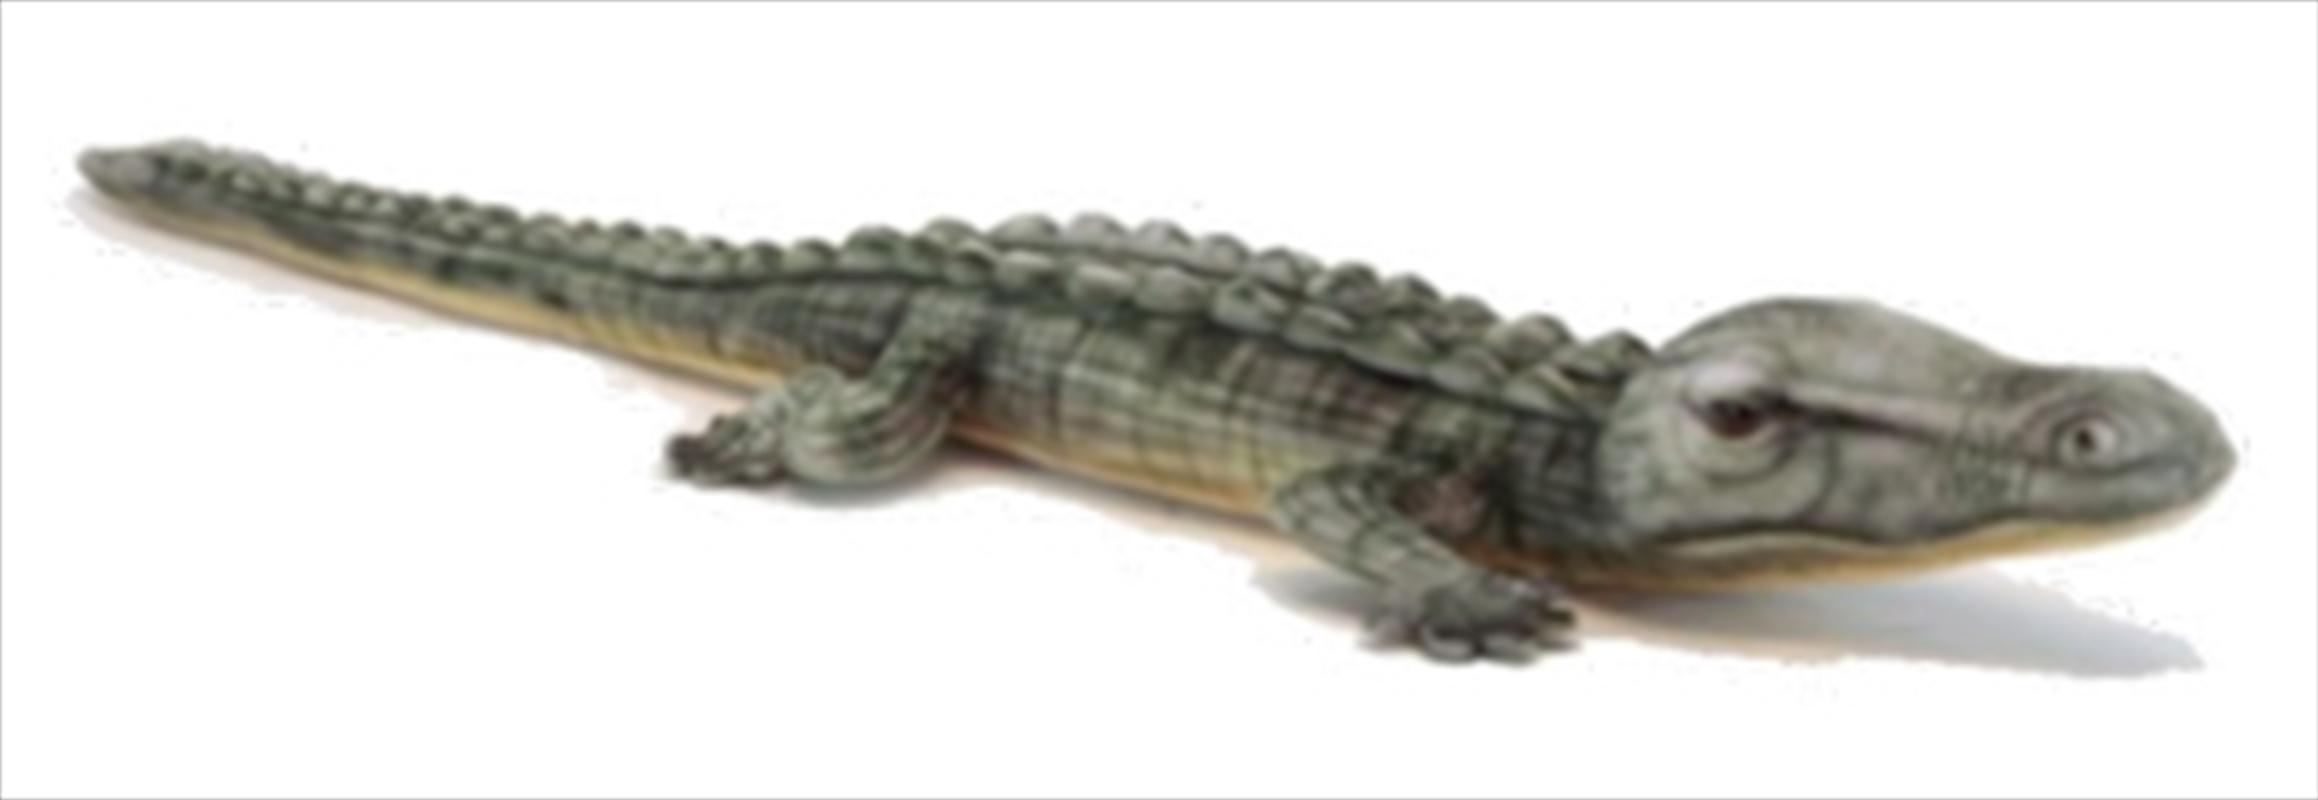 Crocodile Salt Water 70cm L | Toy